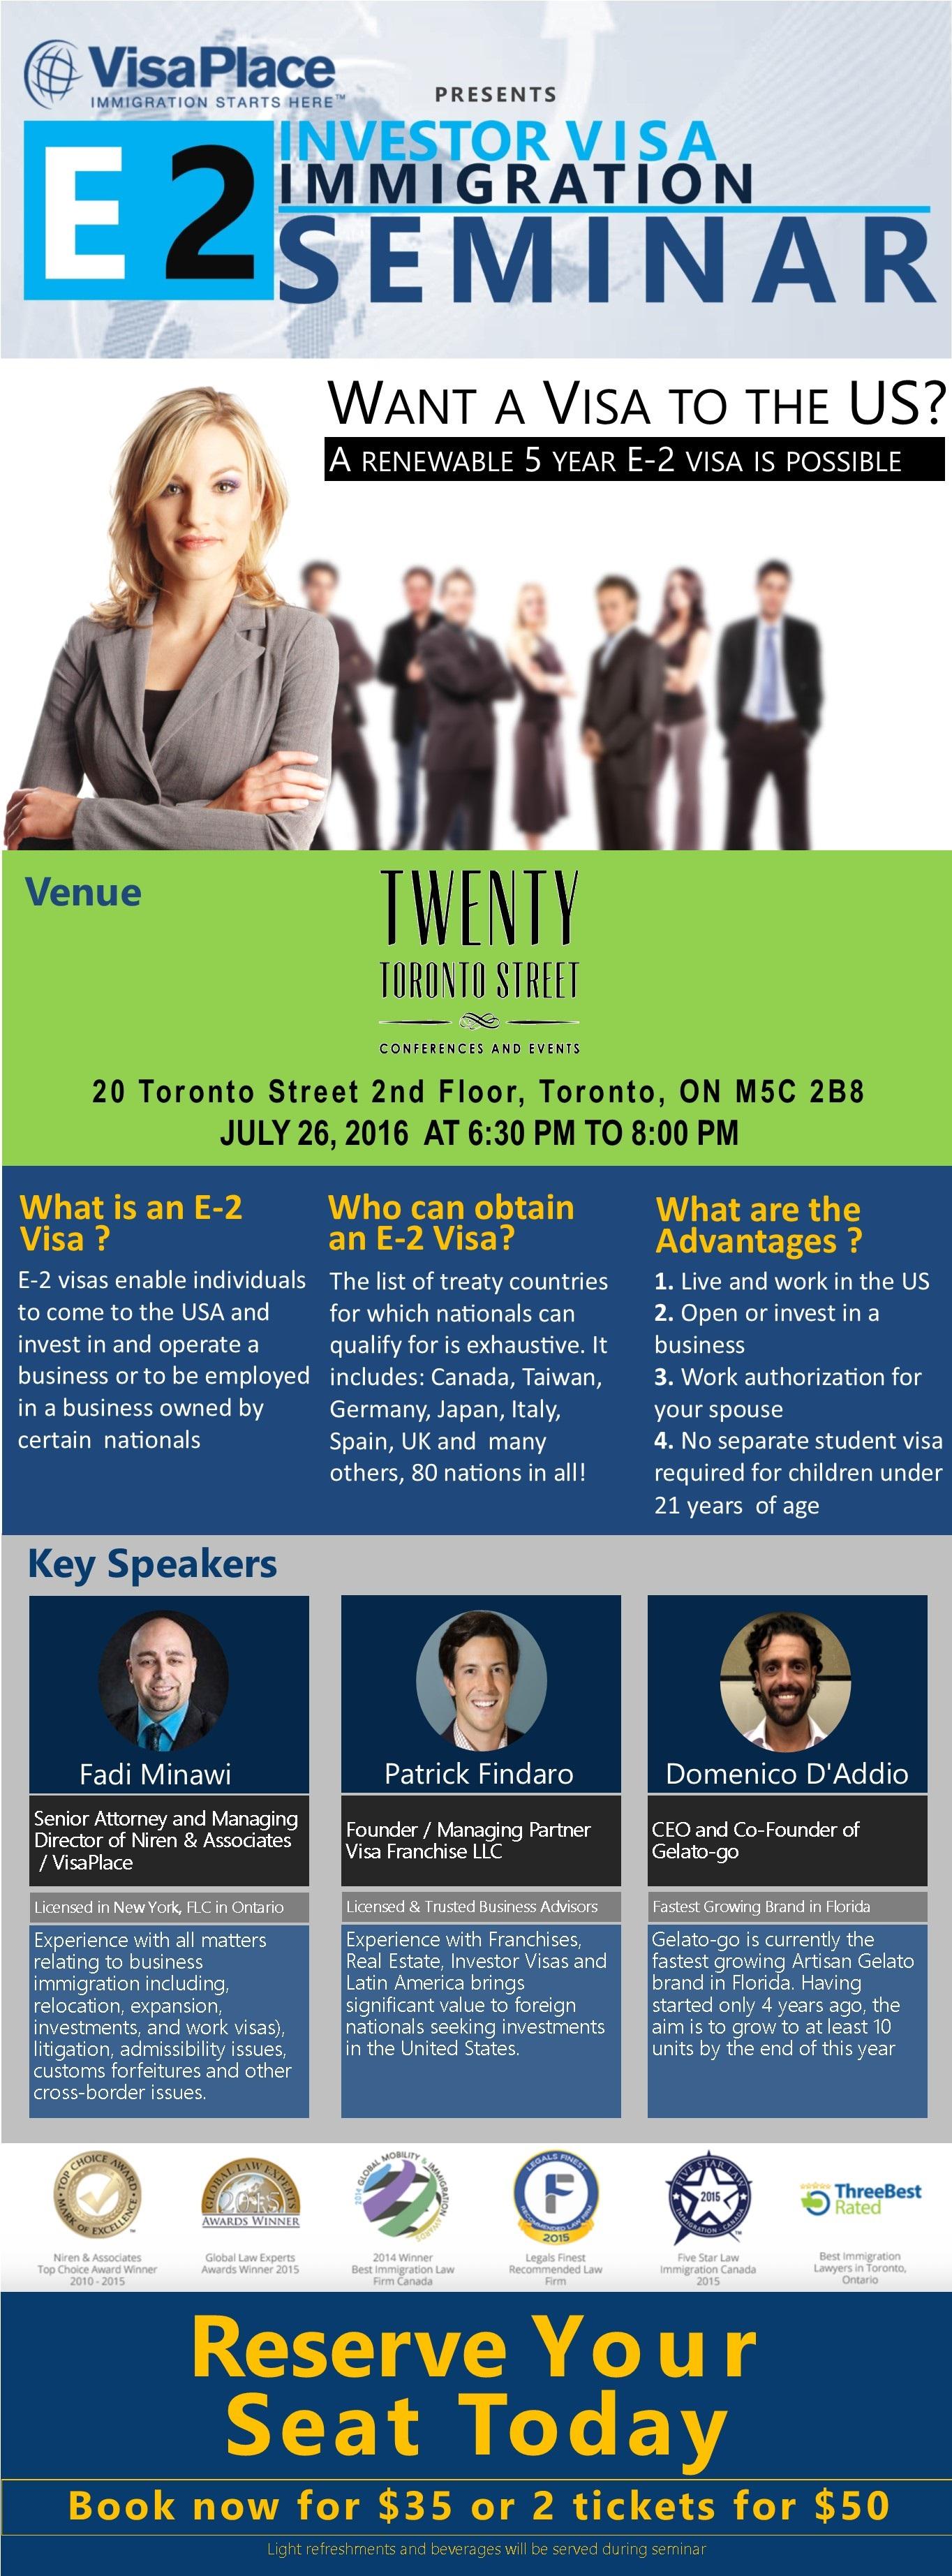 E 2 Investor Visa Seminar